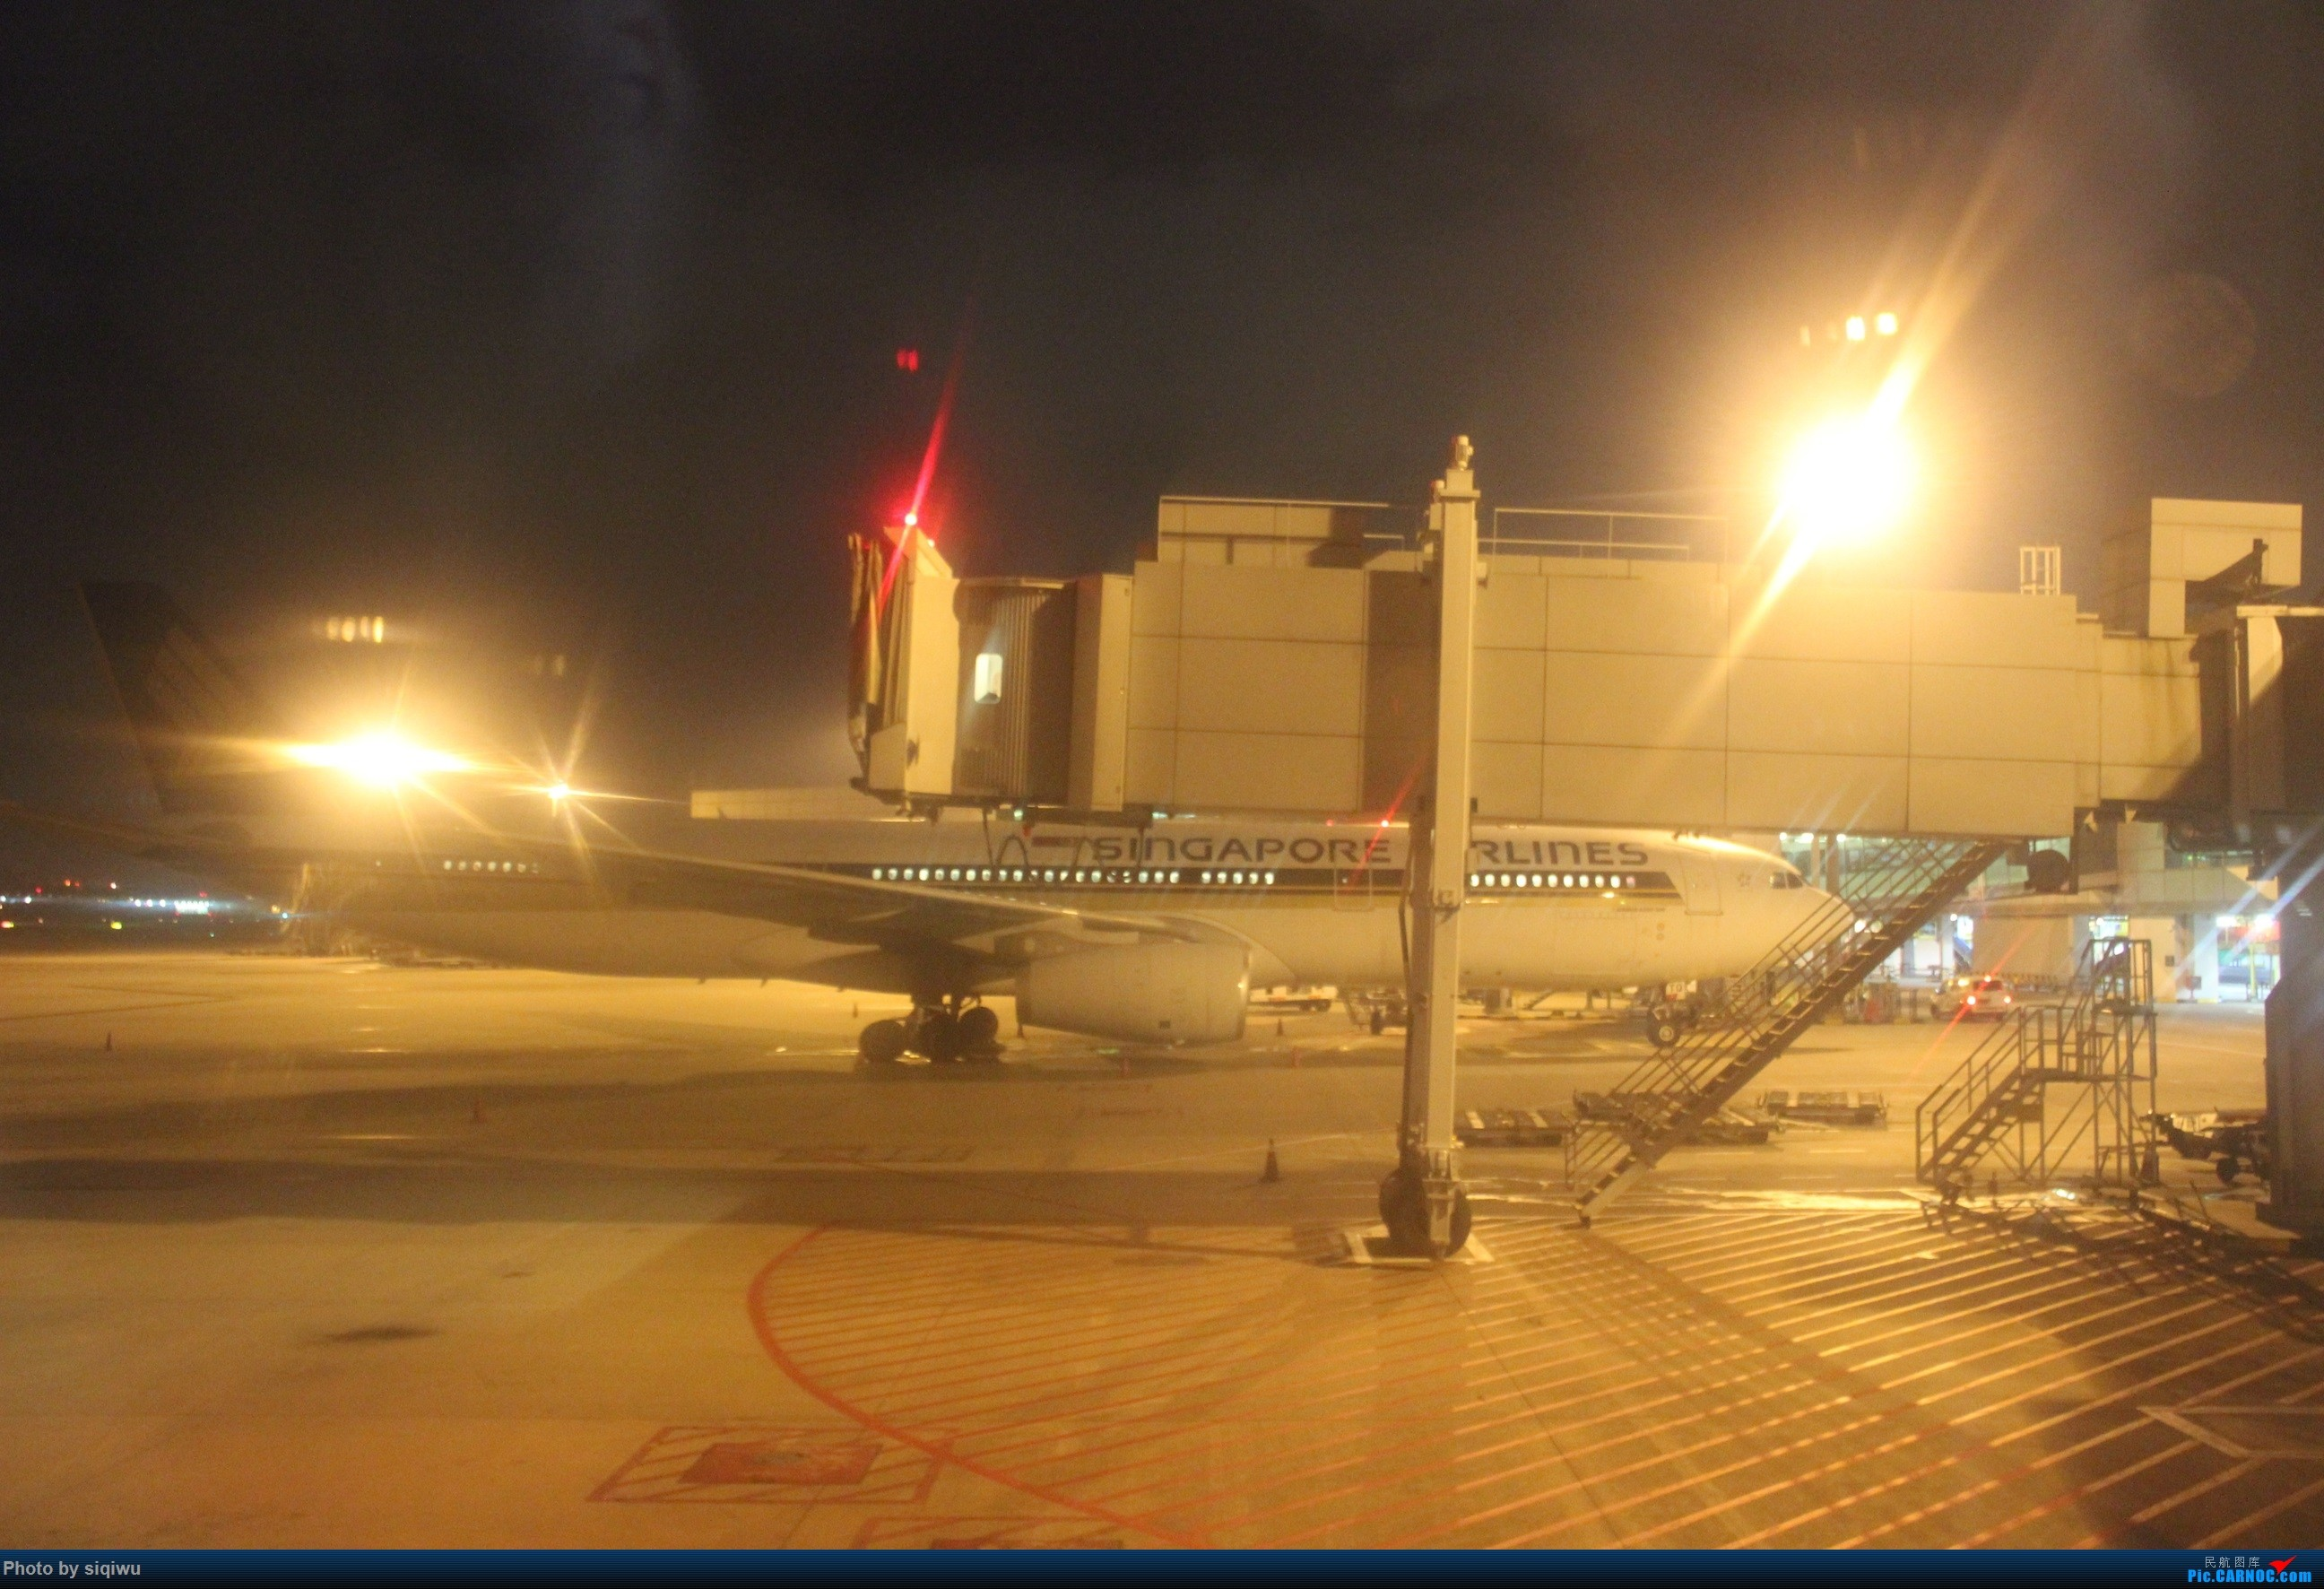 Re:[飞行游记] 20161111 NKG-SIN-NKG/双十一新加坡周末游/往返MU A320执飞